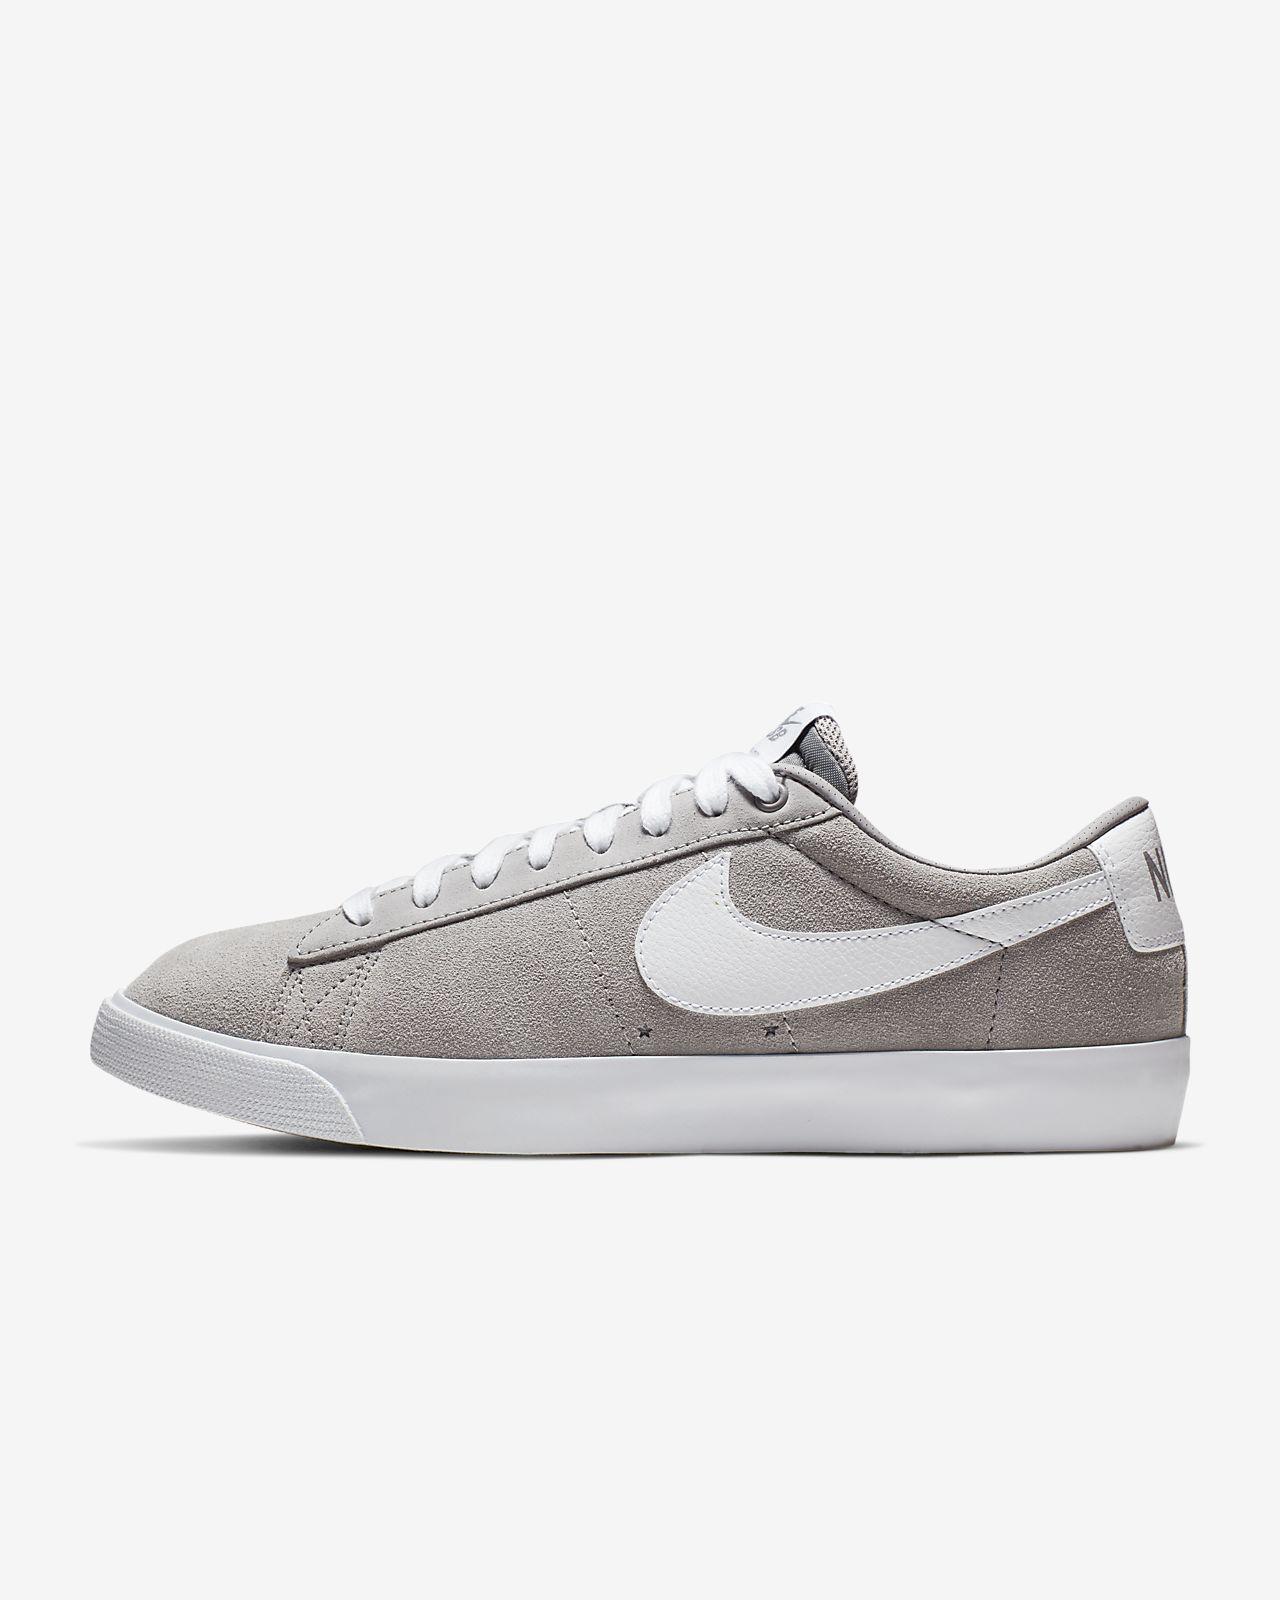 premium selection 0125c ecac8 Nike SB Blazer Low GT Skate Shoe